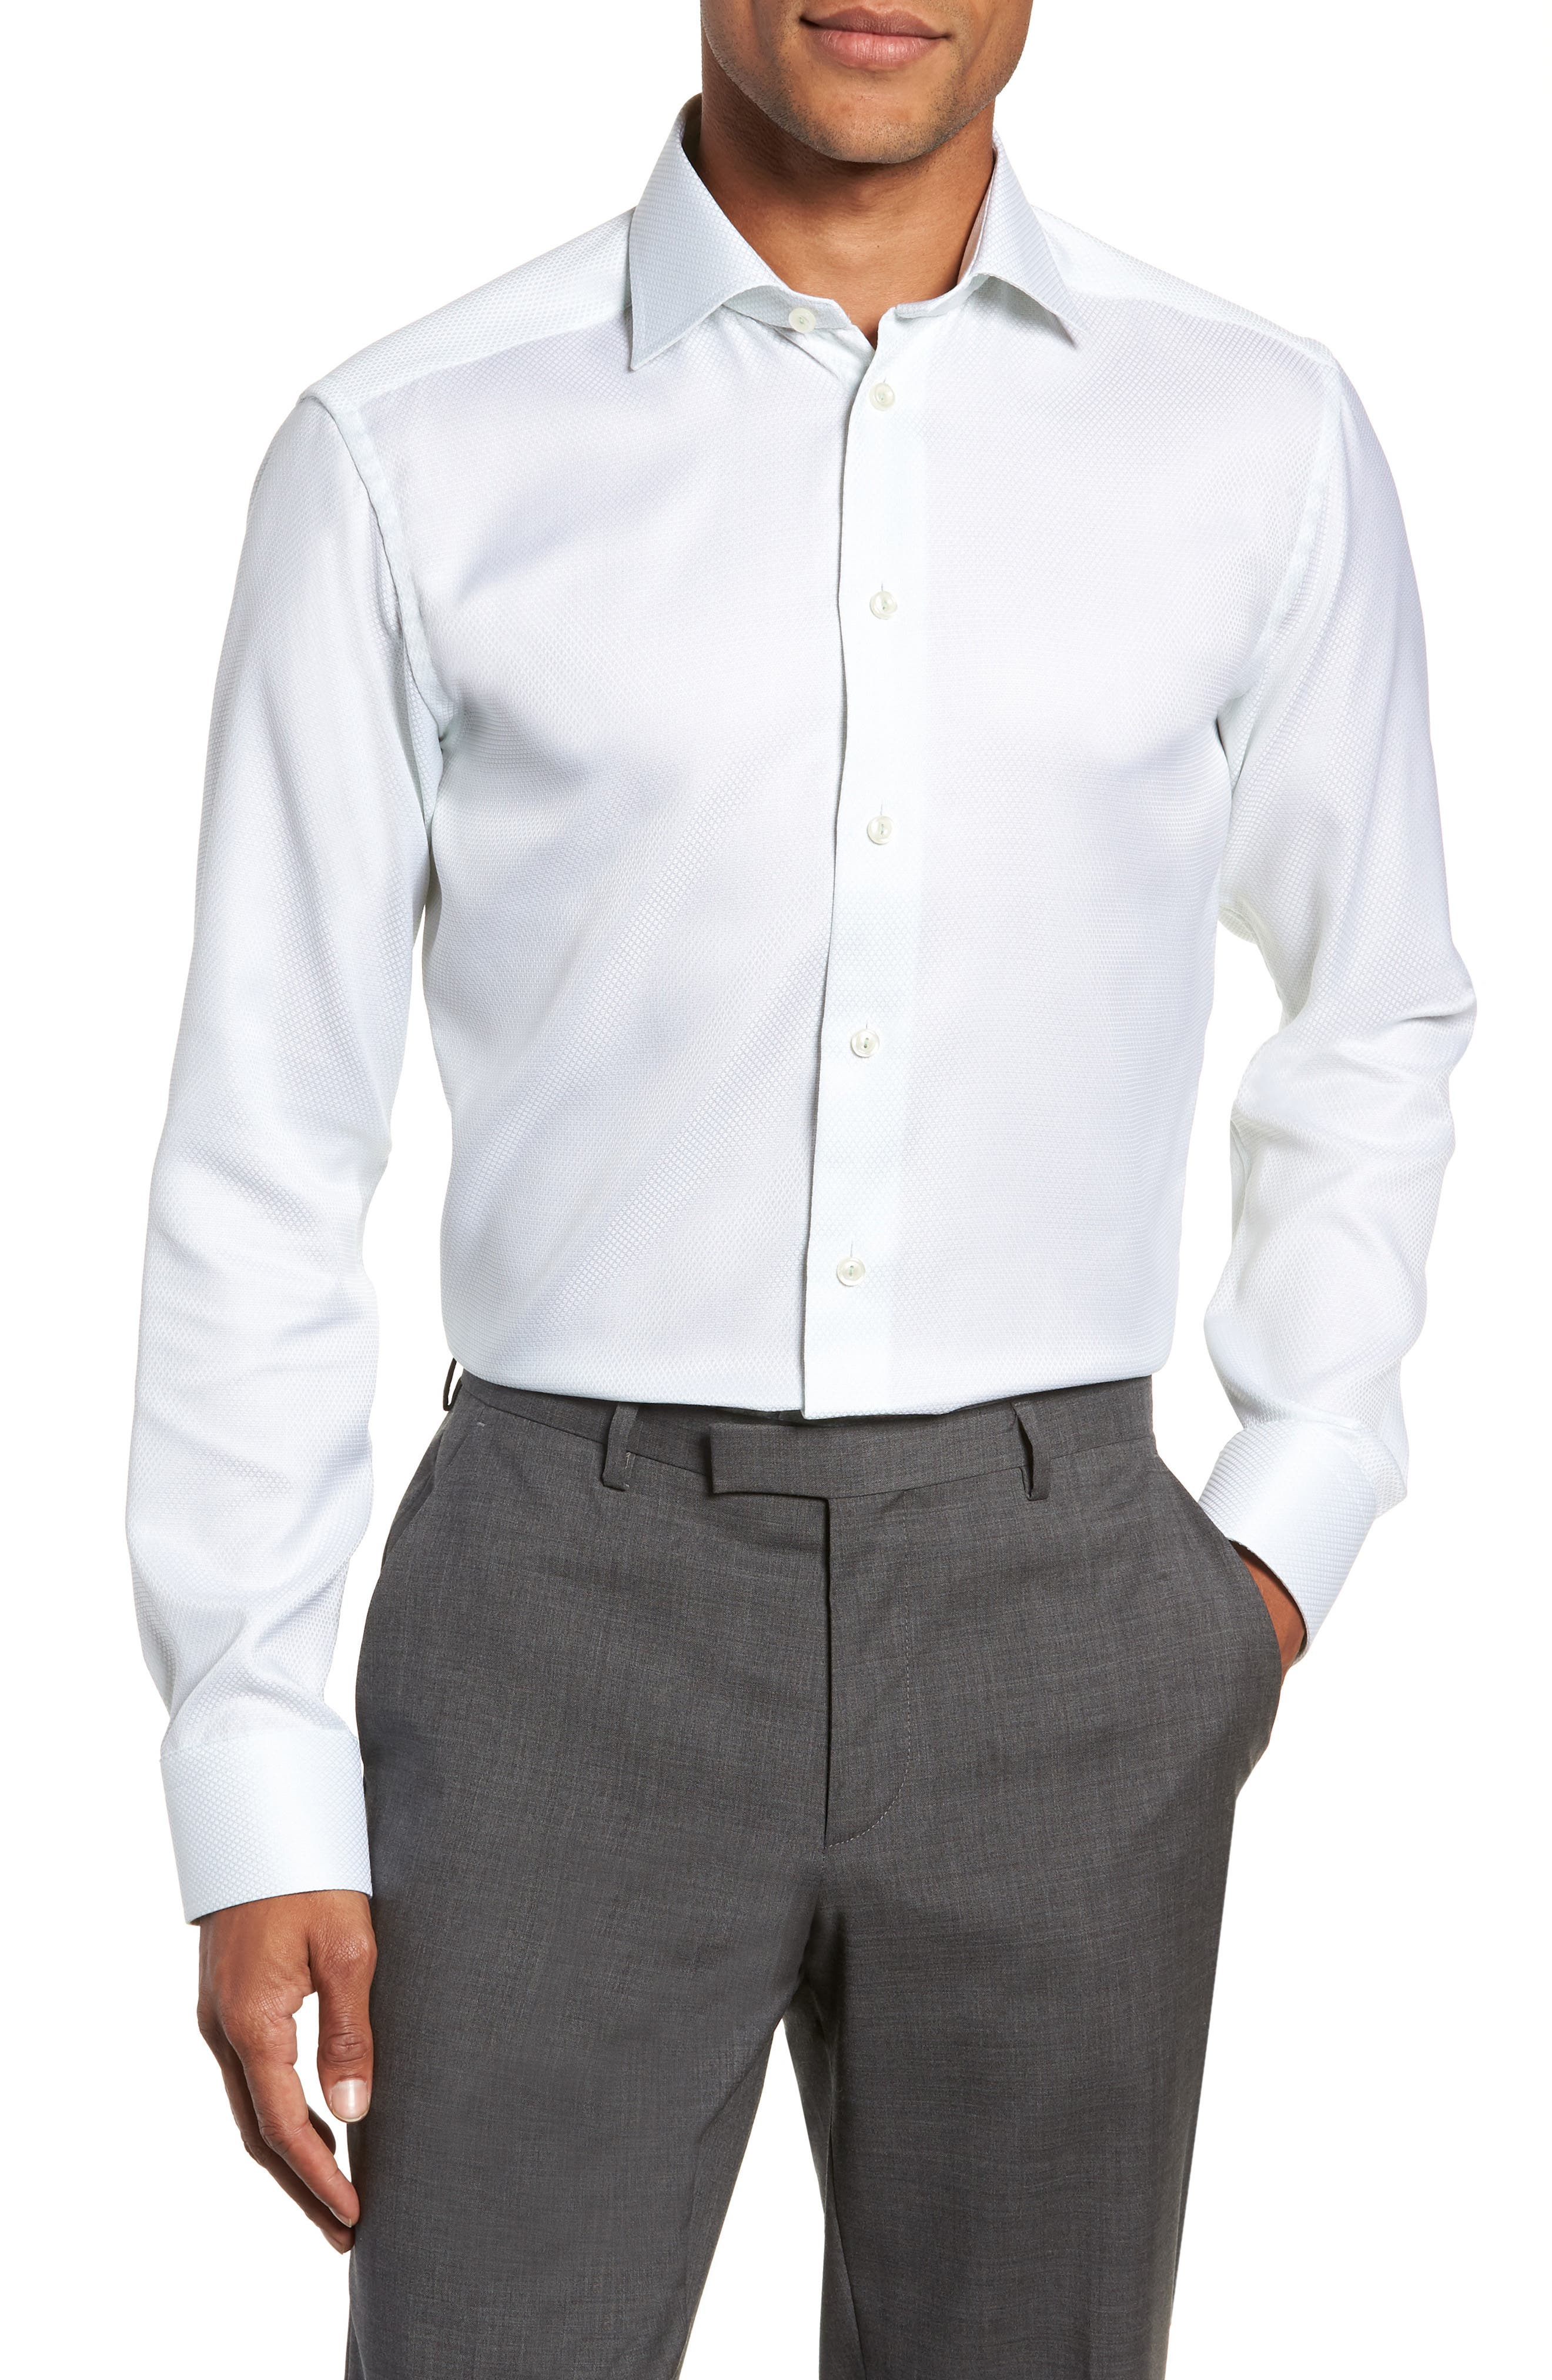 ETON SLIM FIT TEXTURED SOLID DRESS SHIRT